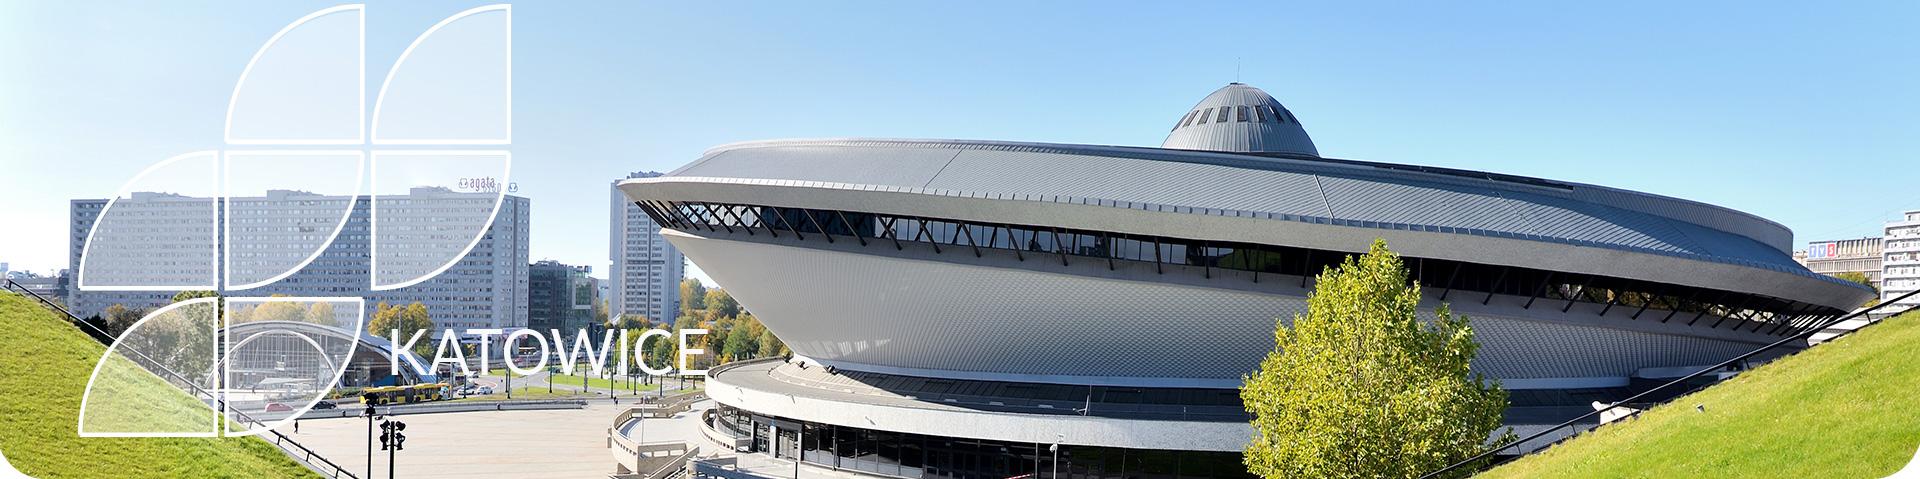 Laserowa korekcja wzroku Katowice